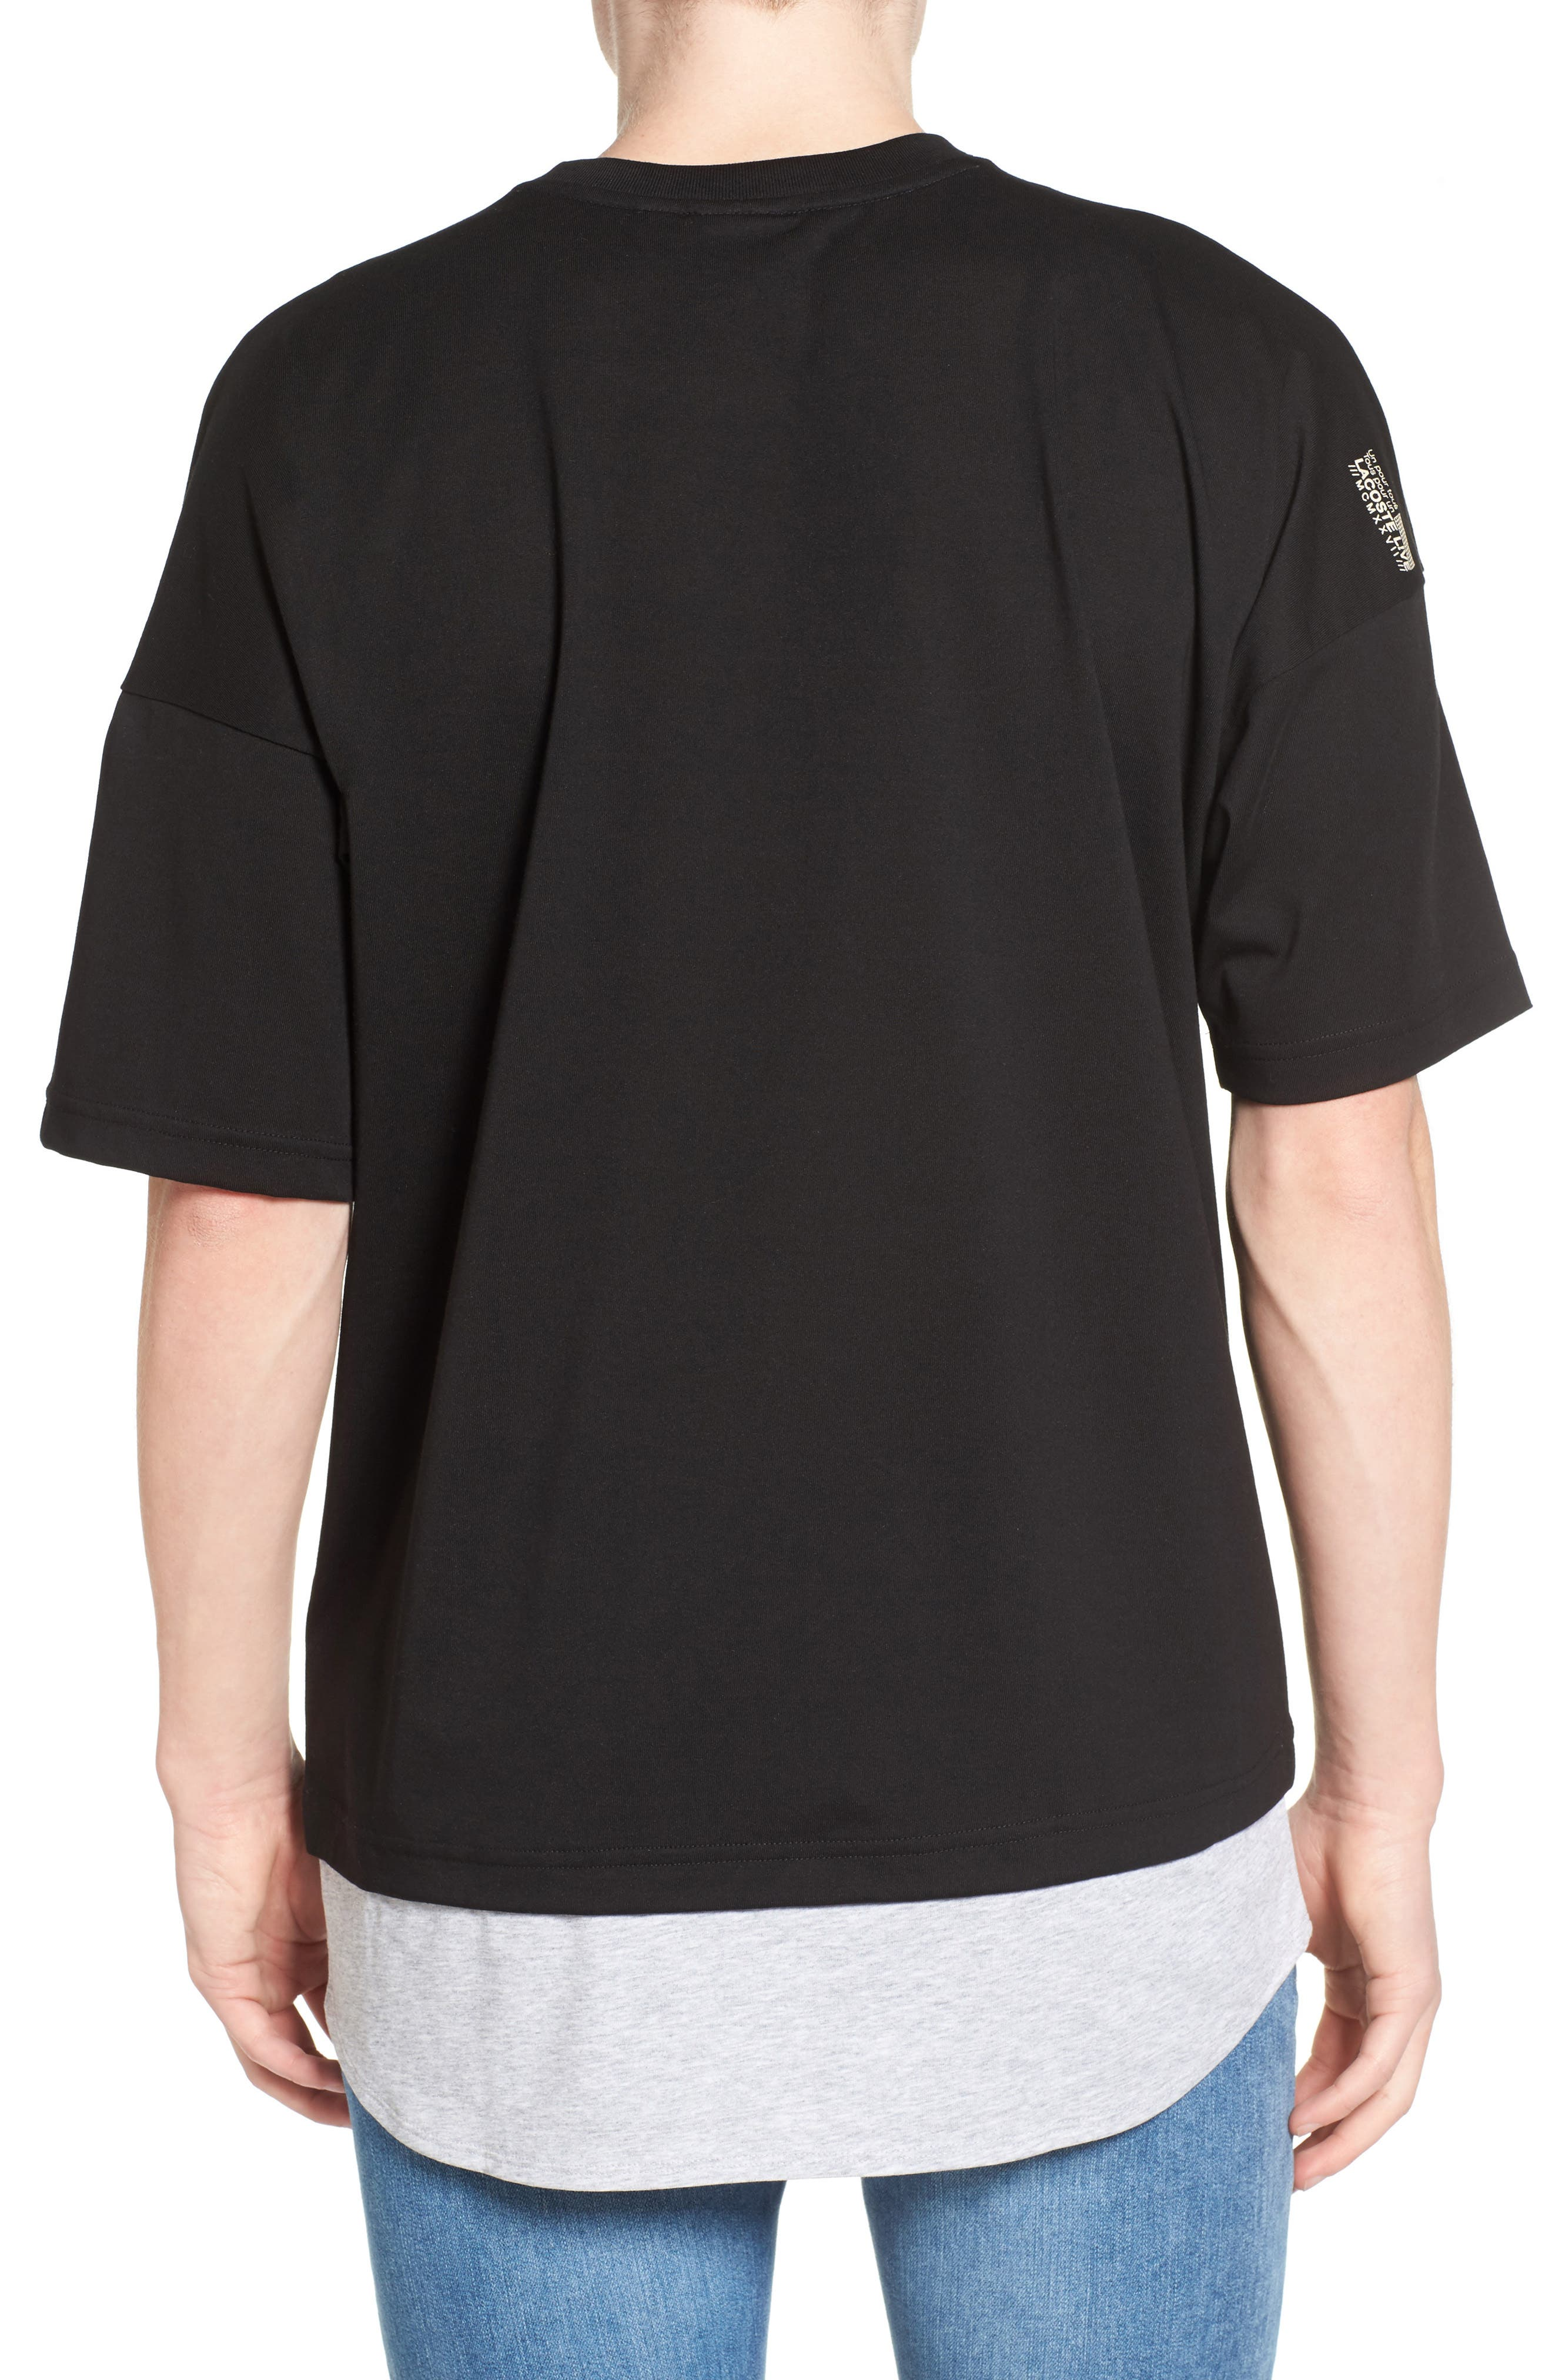 Alternate Image 2  - Lacoste L!VE Mock Layer T-Shirt